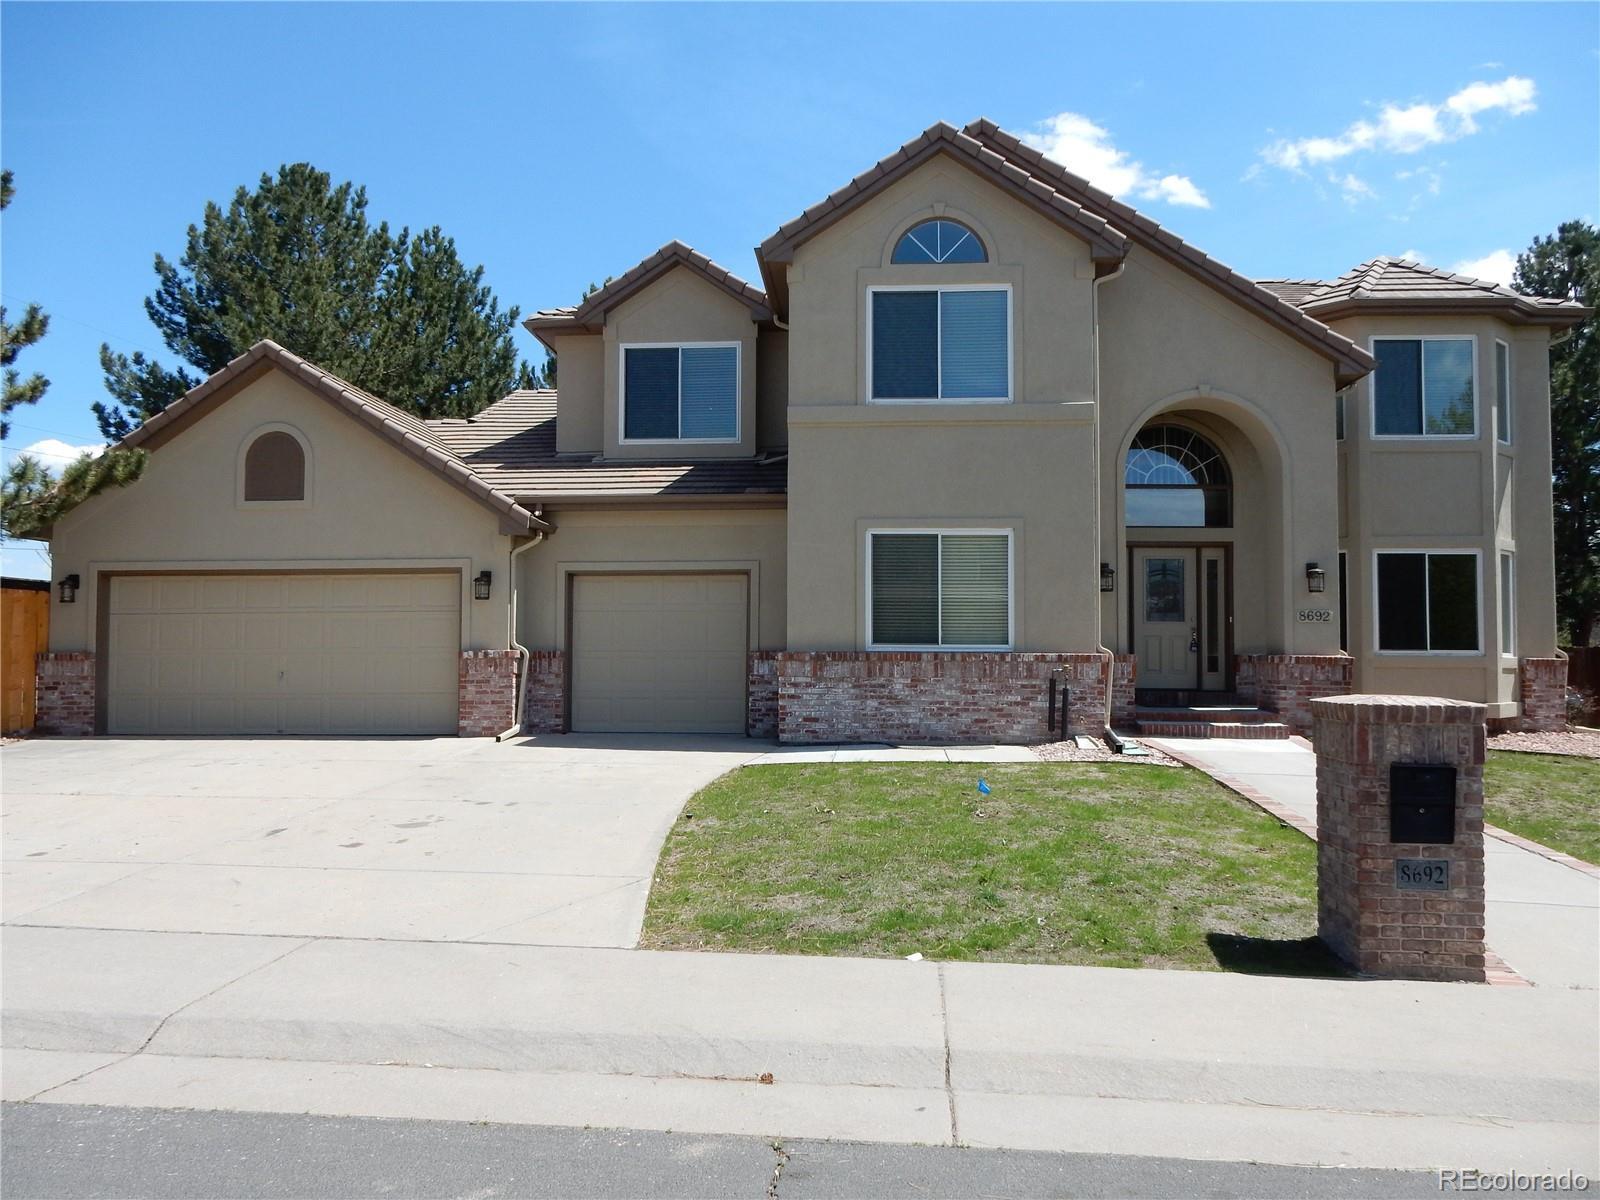 8692 E Hawaii Drive Property Photo - Denver, CO real estate listing